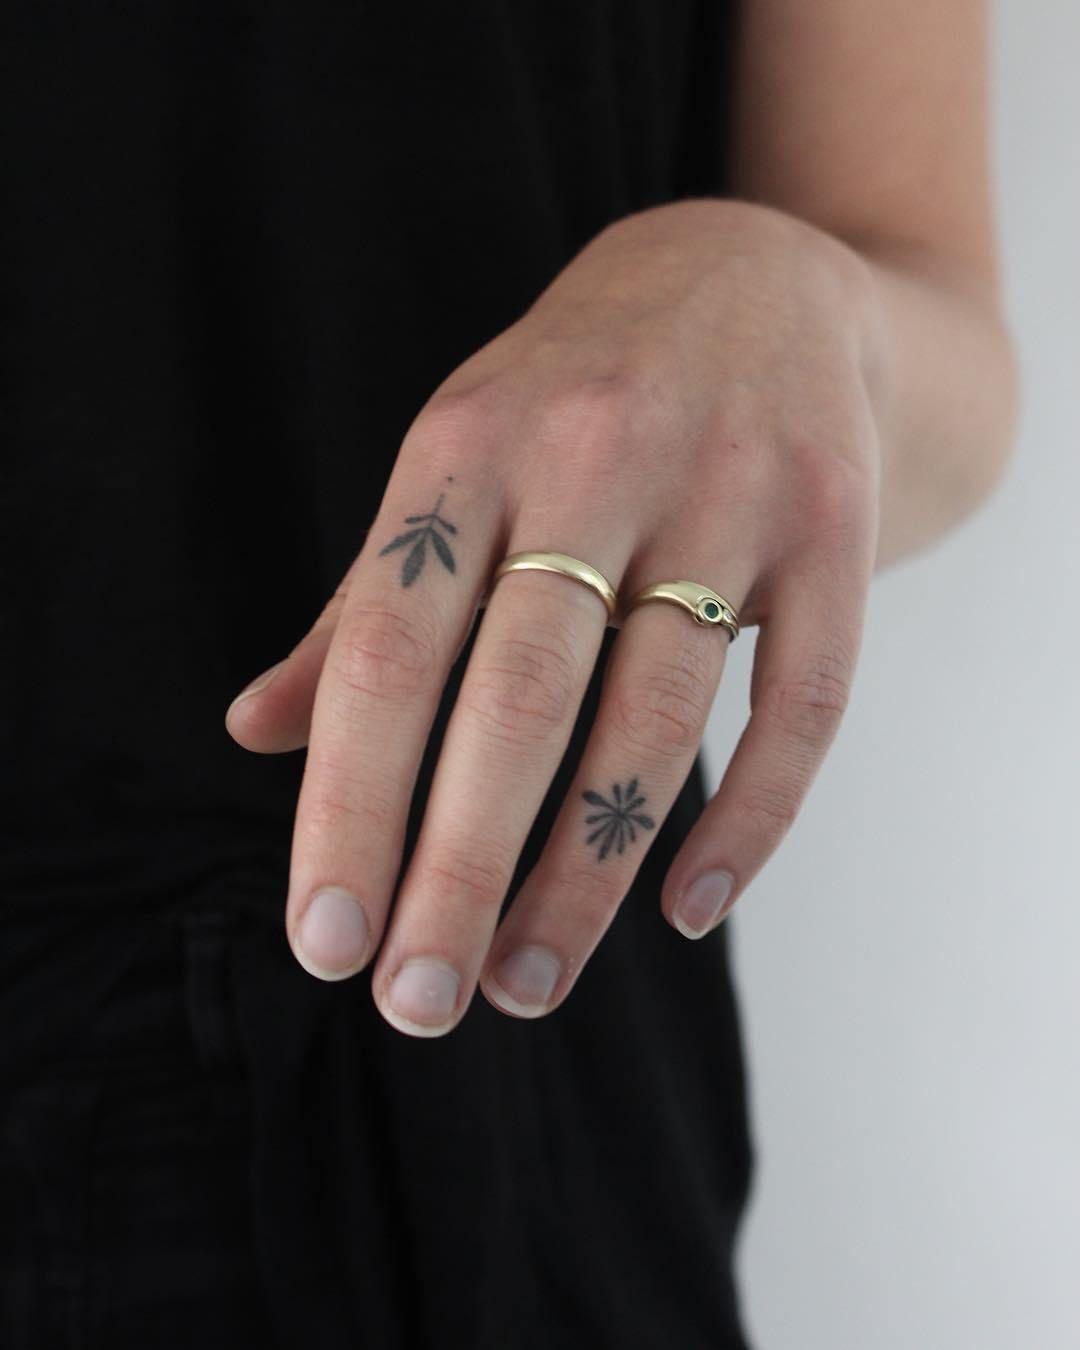 Photo of 40 Amazing Finger Tattoo For Women You'll Love » EcstasyCoffee #tattoosforwomen